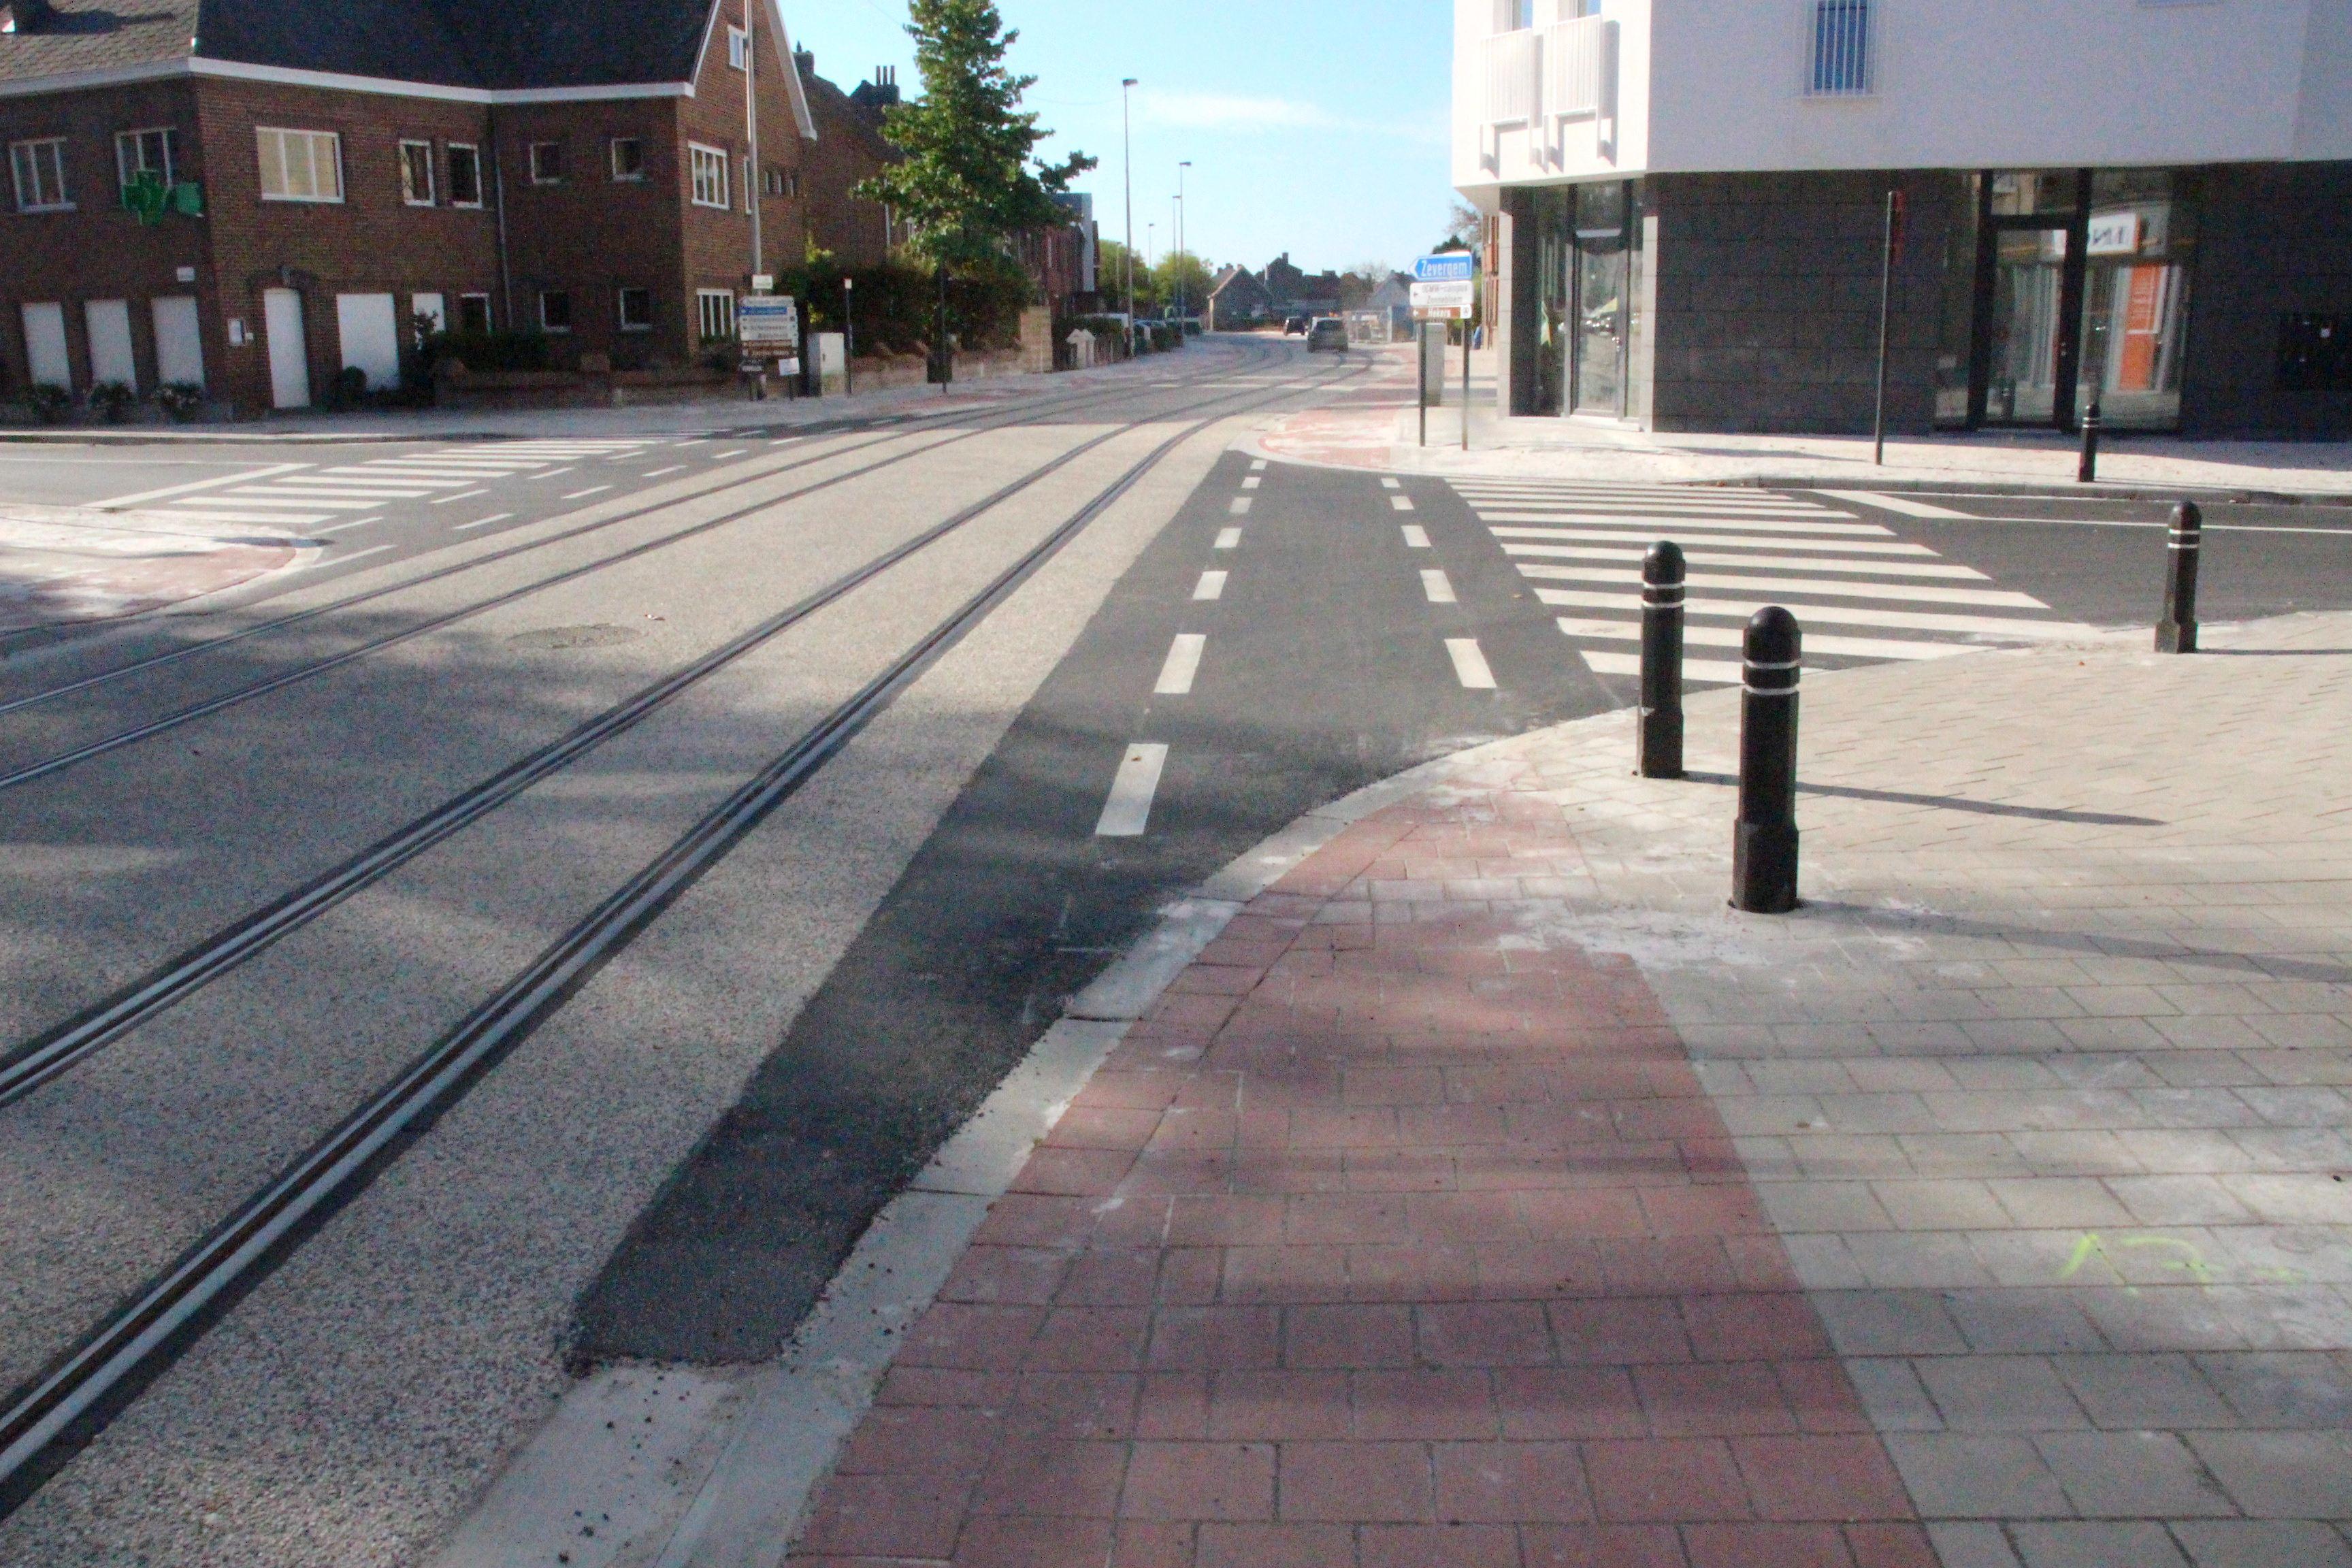 19okt14, 11u49, Heerweg Zuid